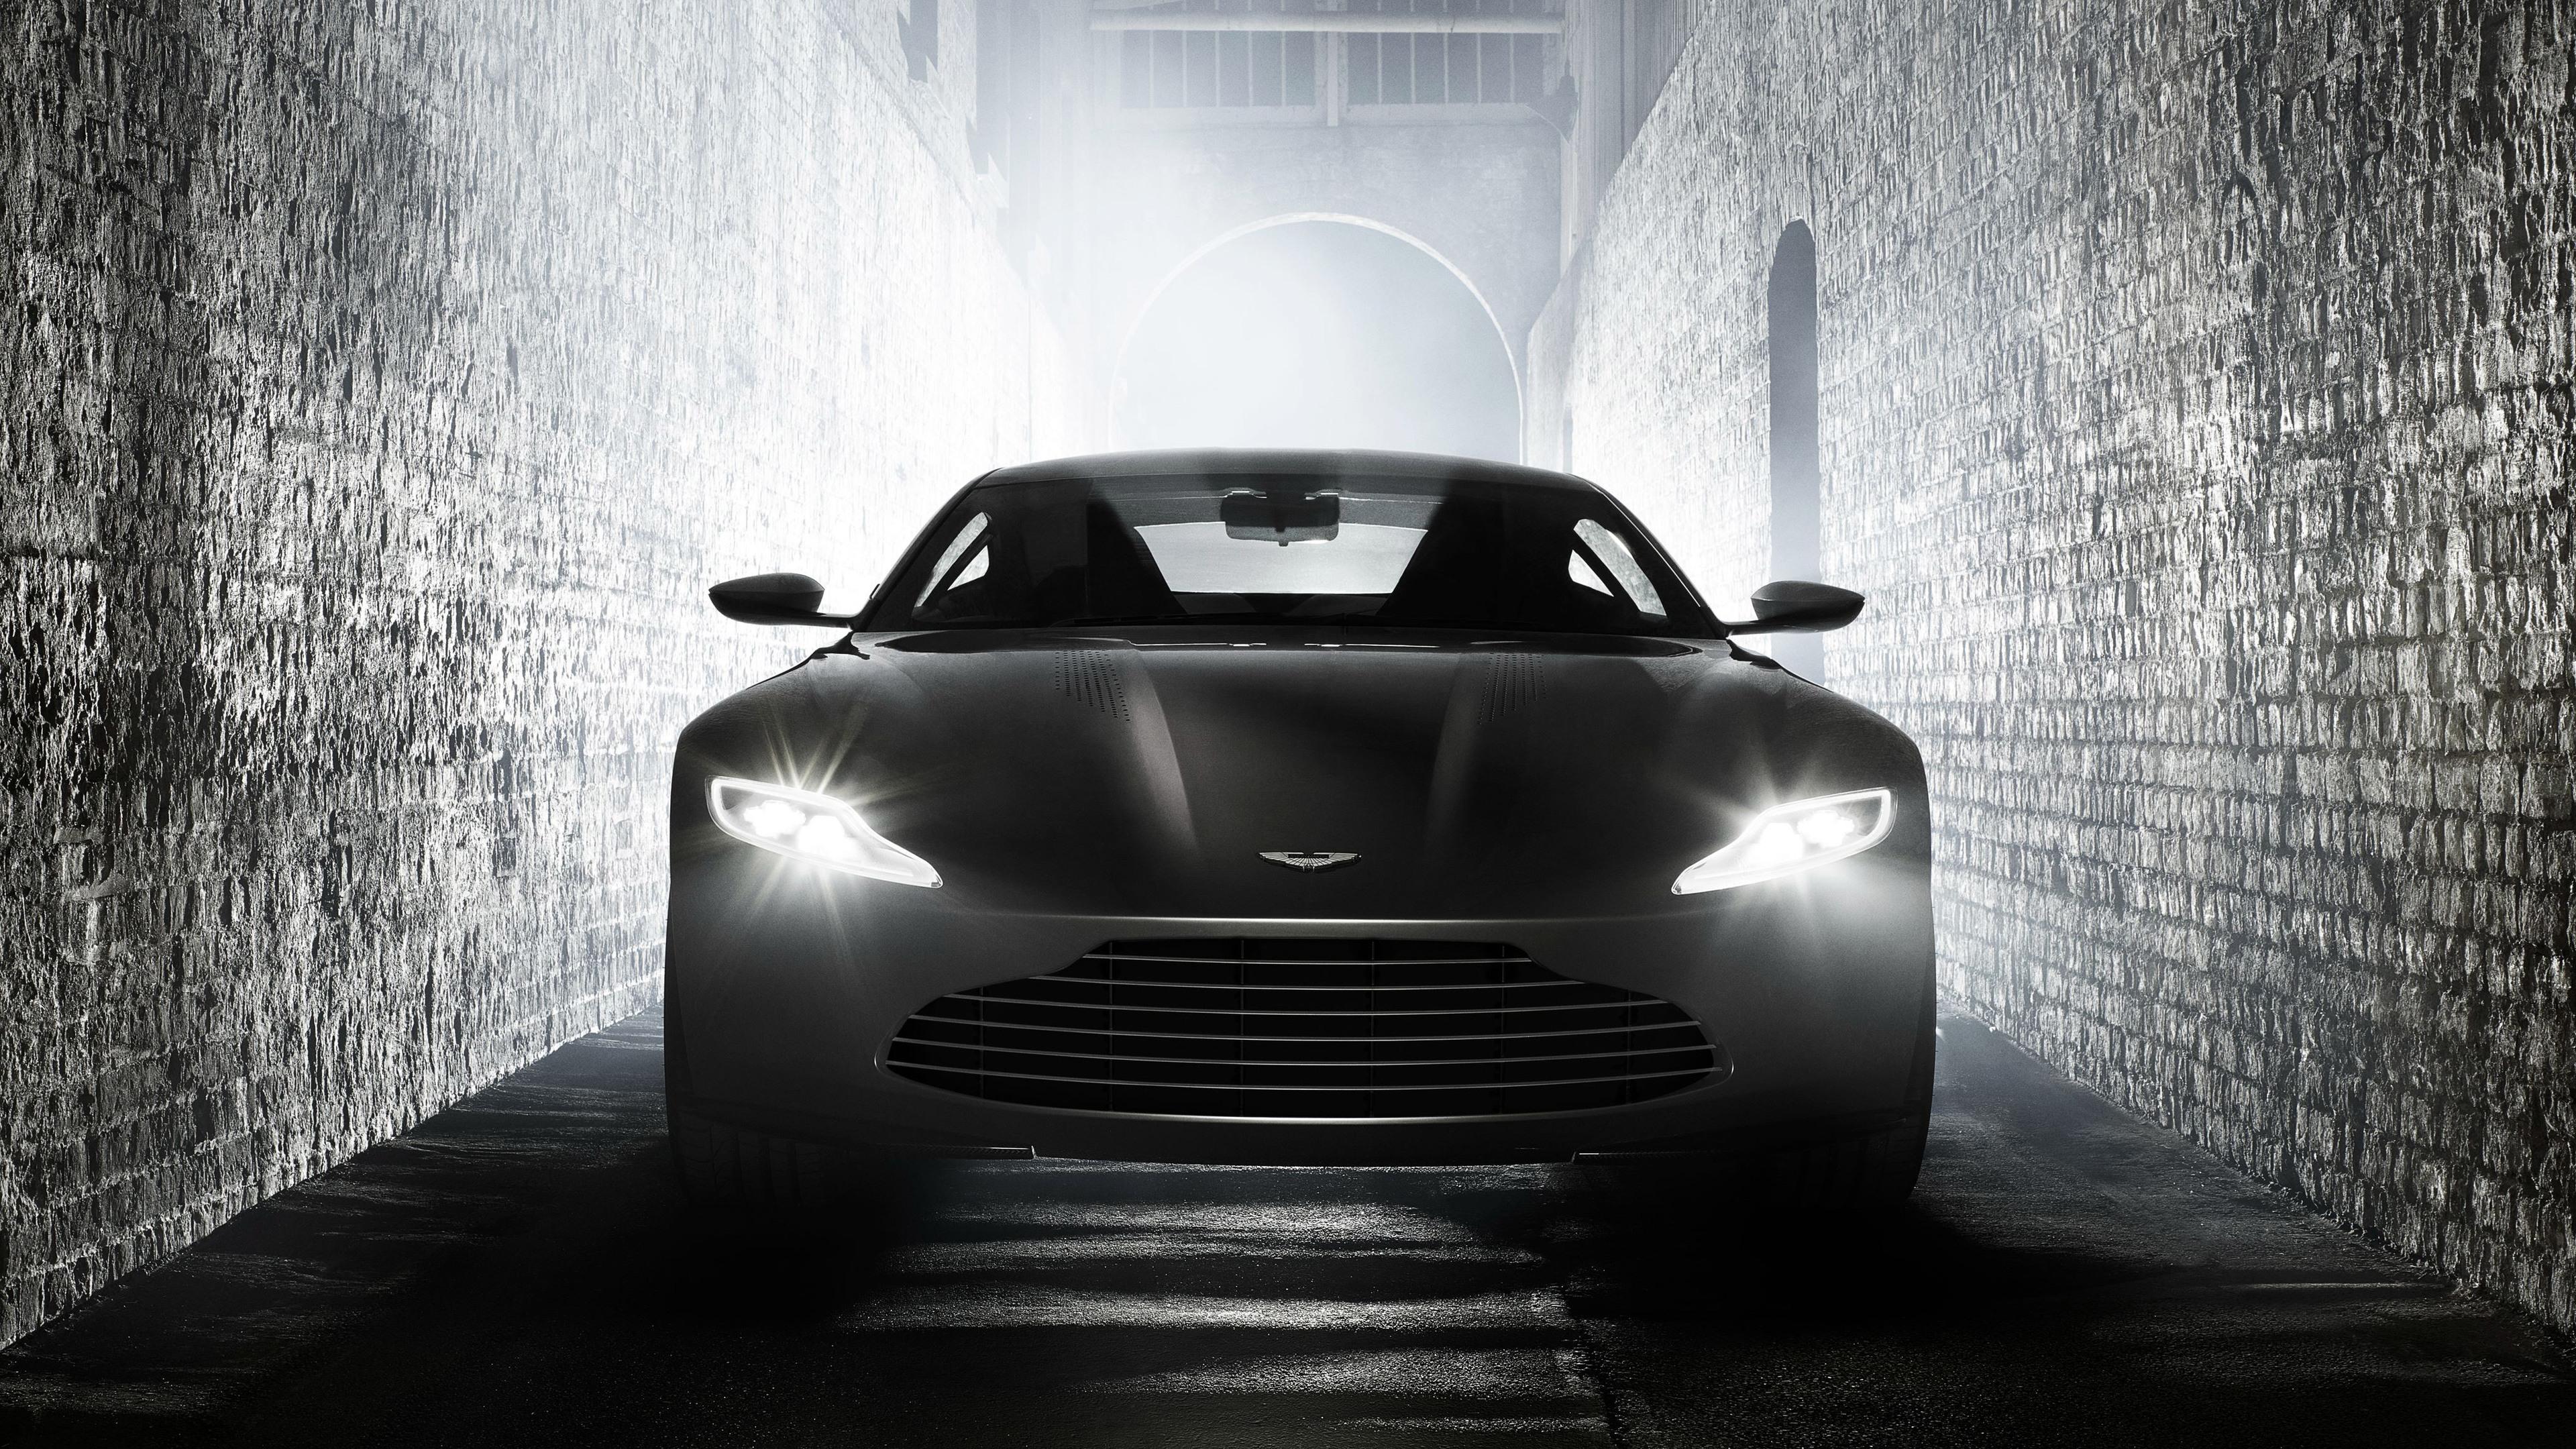 aston martin db10 4k 1539104726 - Aston Martin DB10 4k - cars wallpapers, aston martin wallpapers, 4k-wallpapers